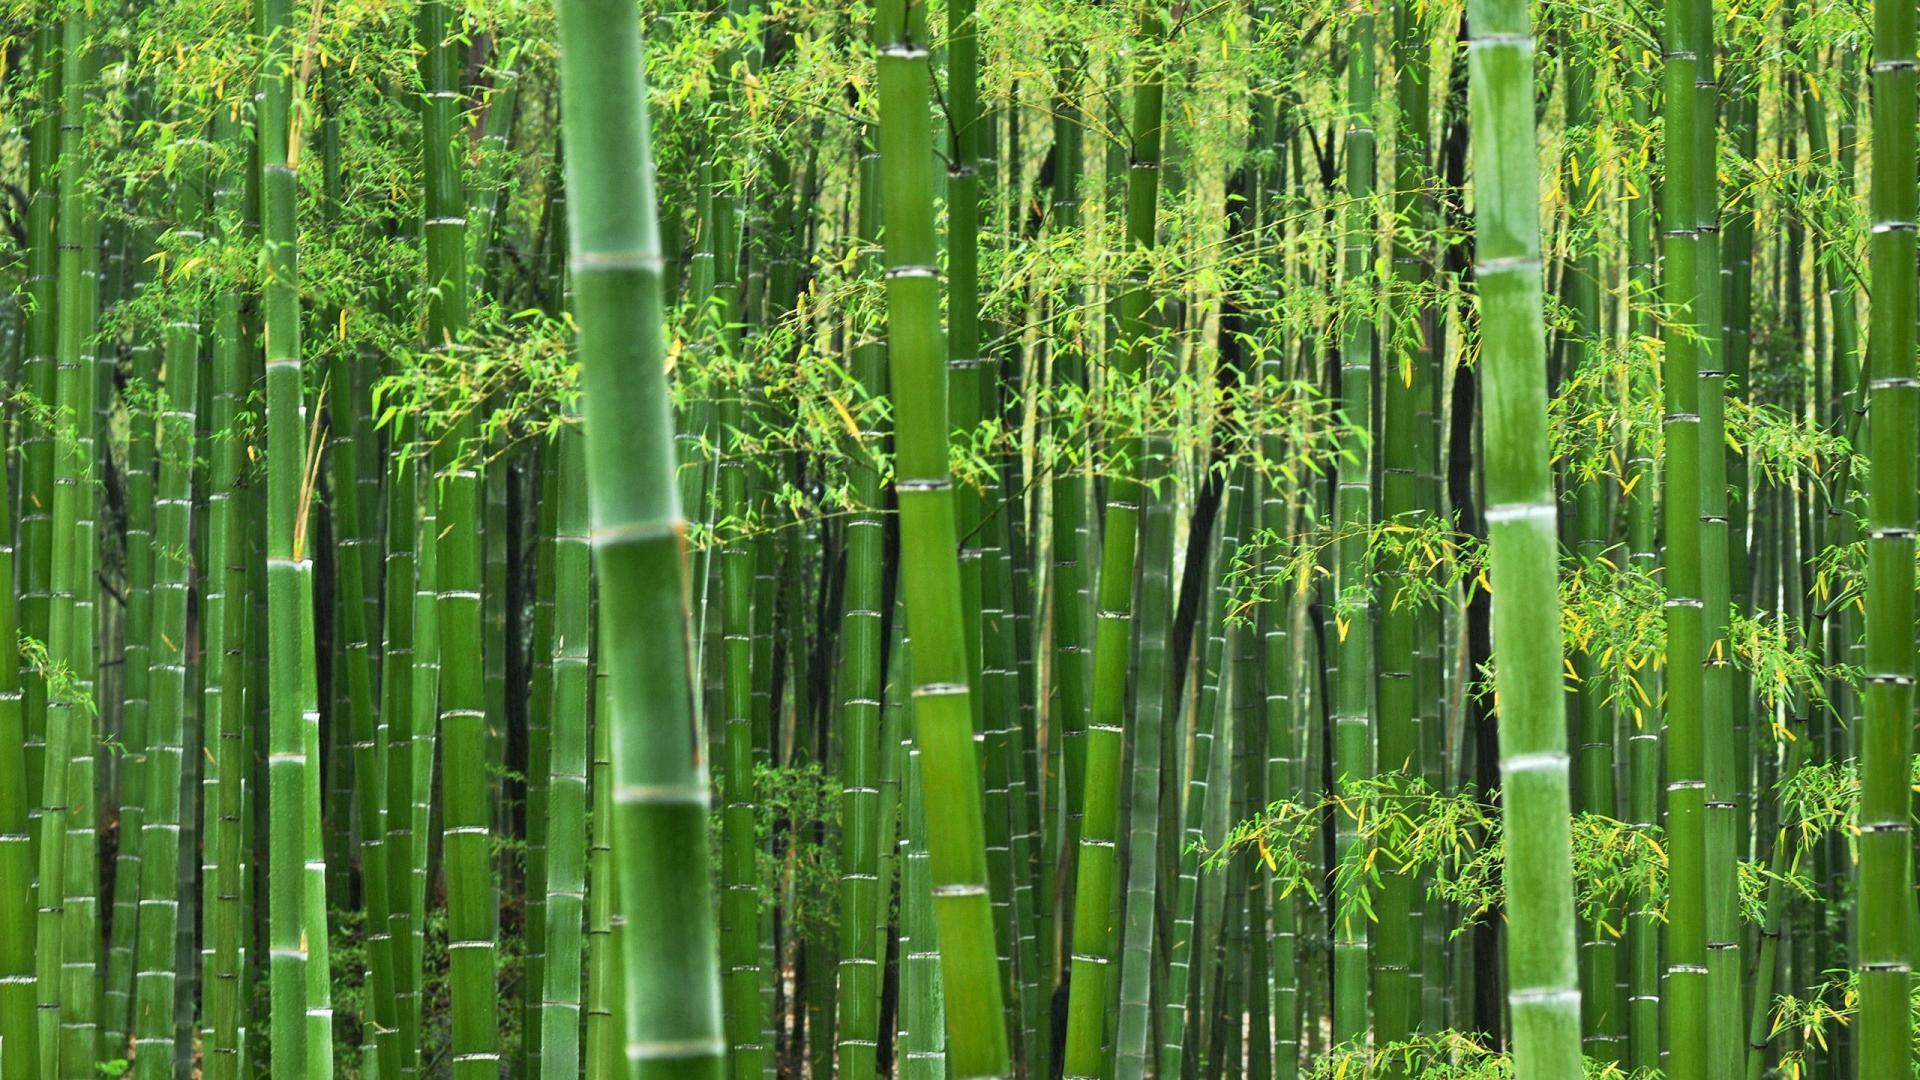 Free HD Bamboo Wallpapers  PixelsTalkNet